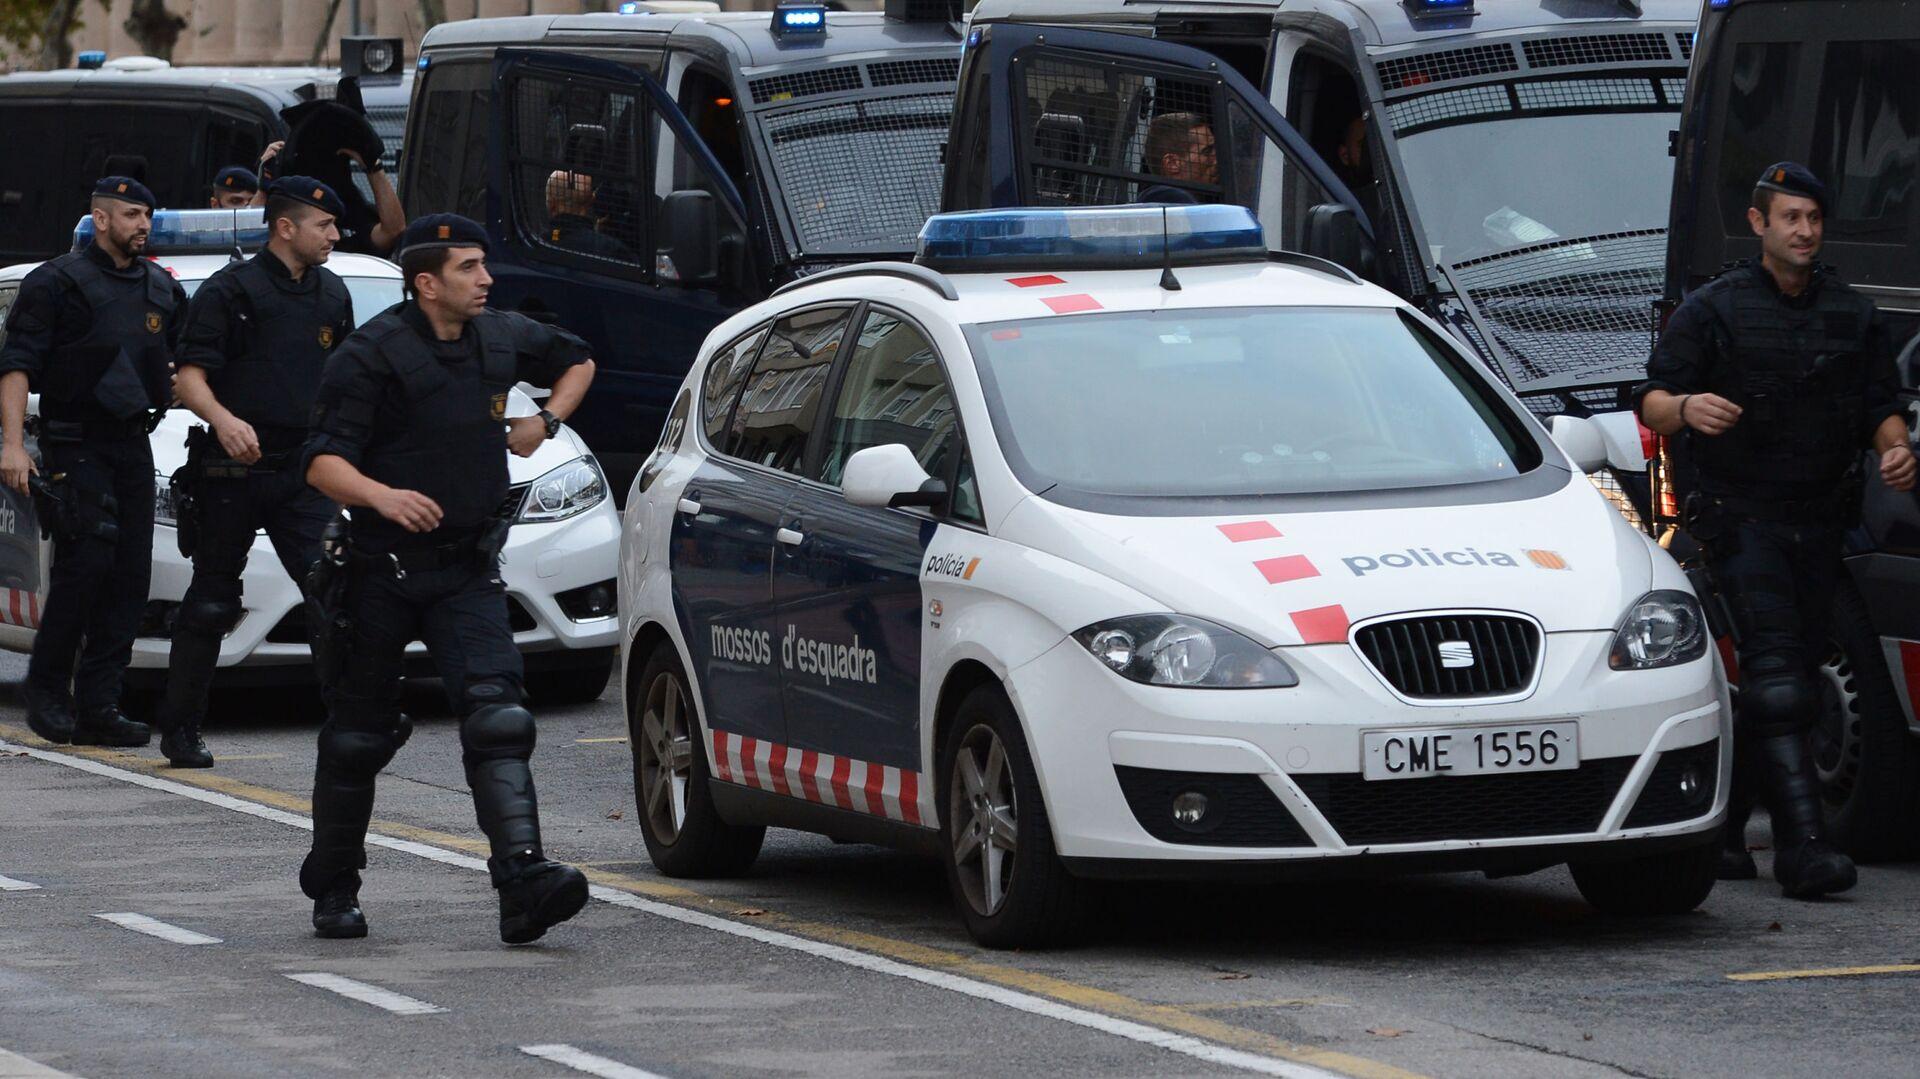 Полиция Испании - Sputnik Грузия, 1920, 02.09.2021